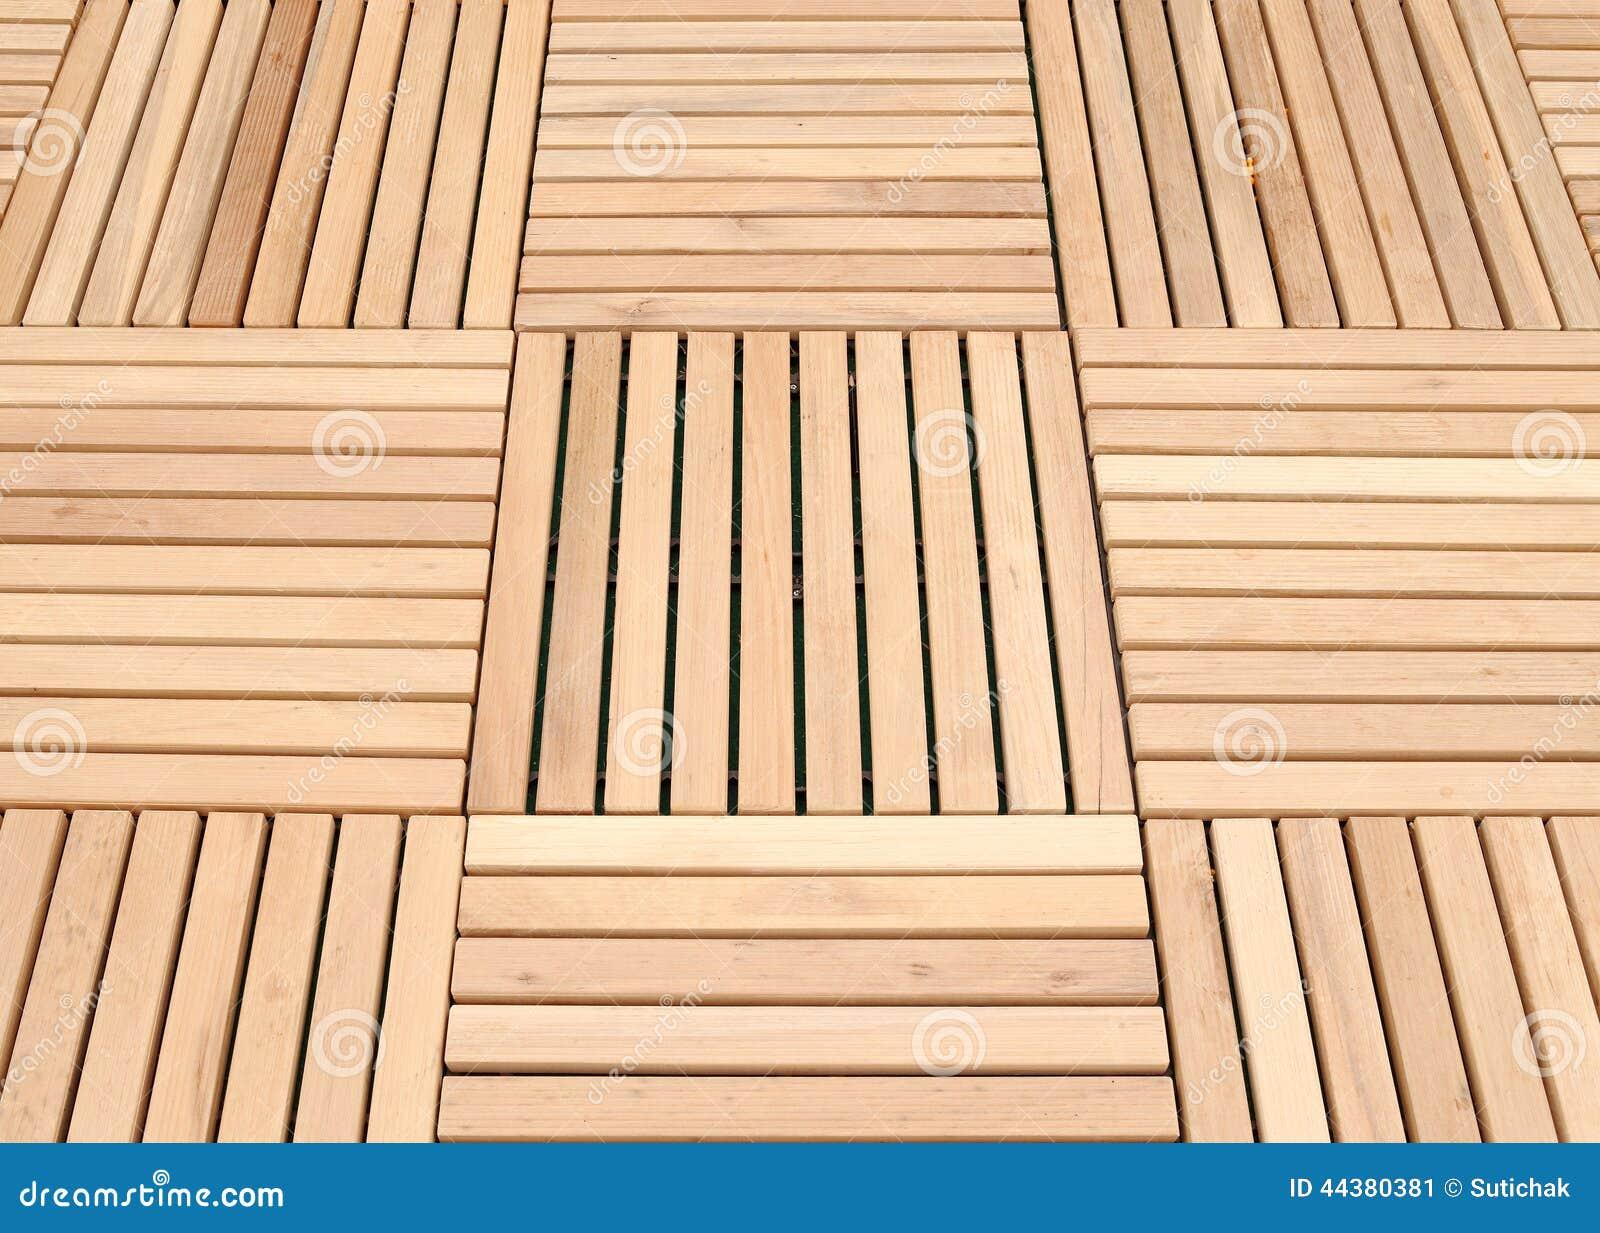 Wood Deck Panel Floor Background Stock Photo Image 44380381